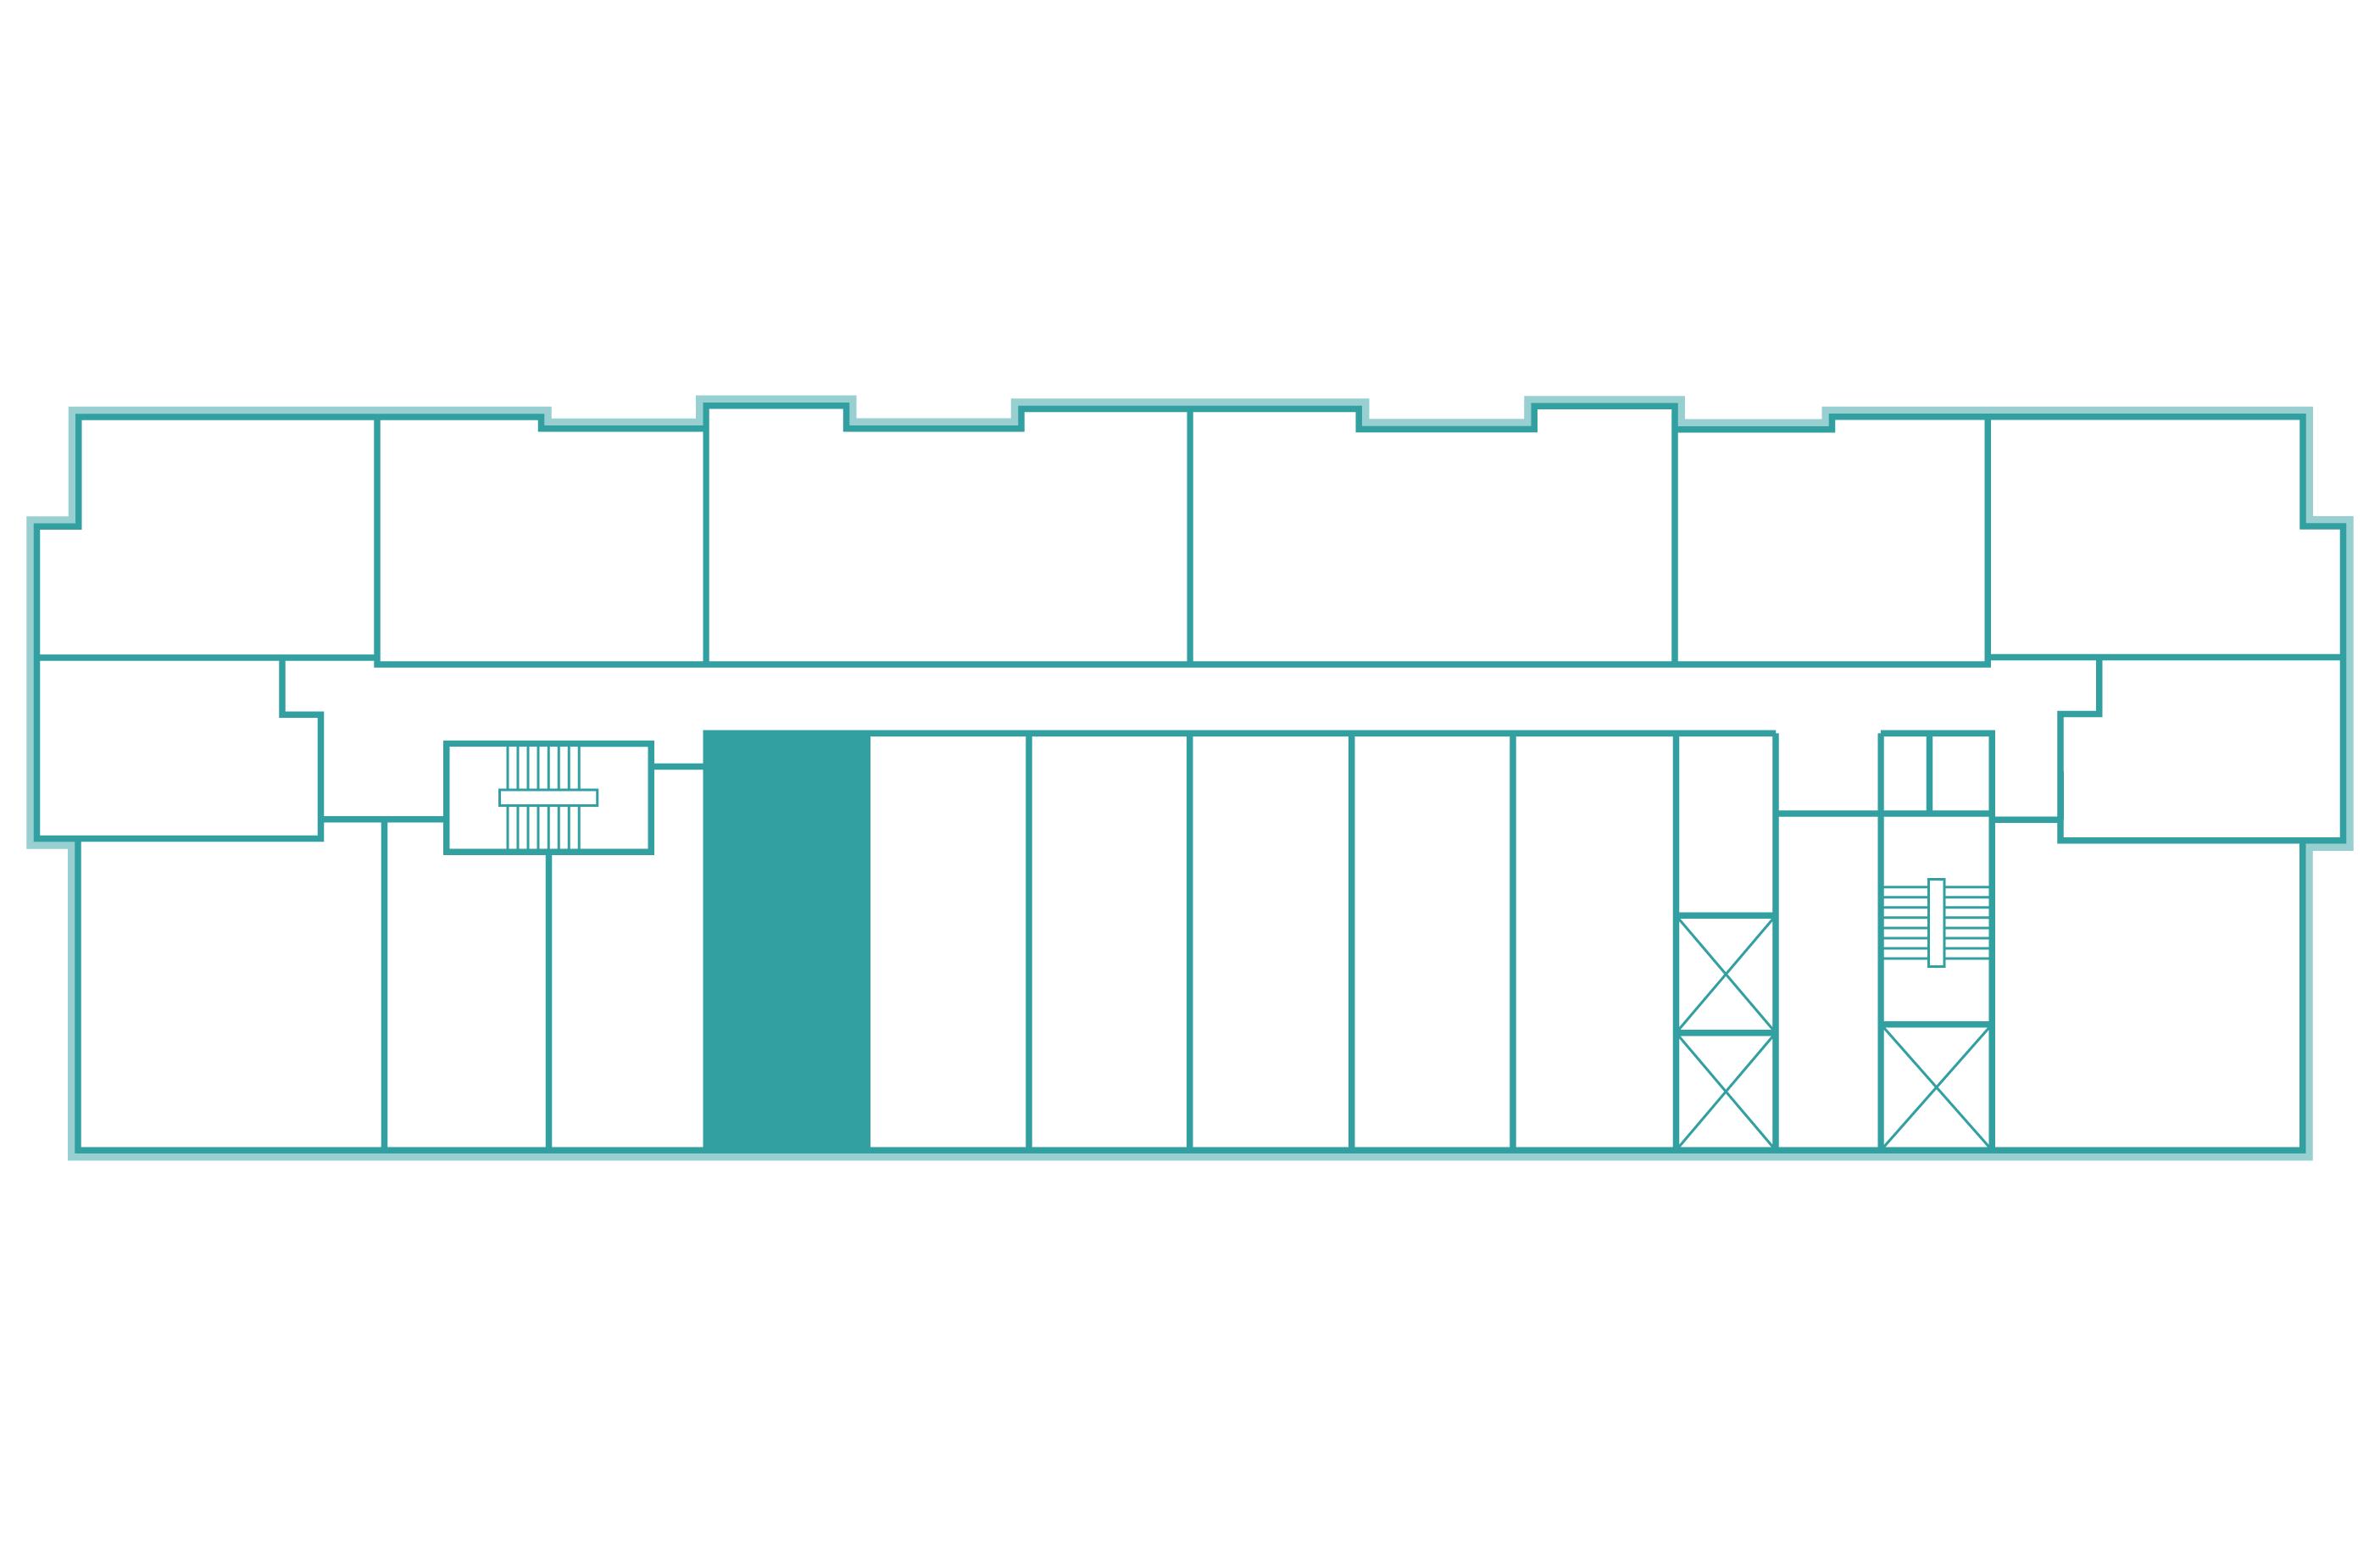 floorplan image of unit image 0406